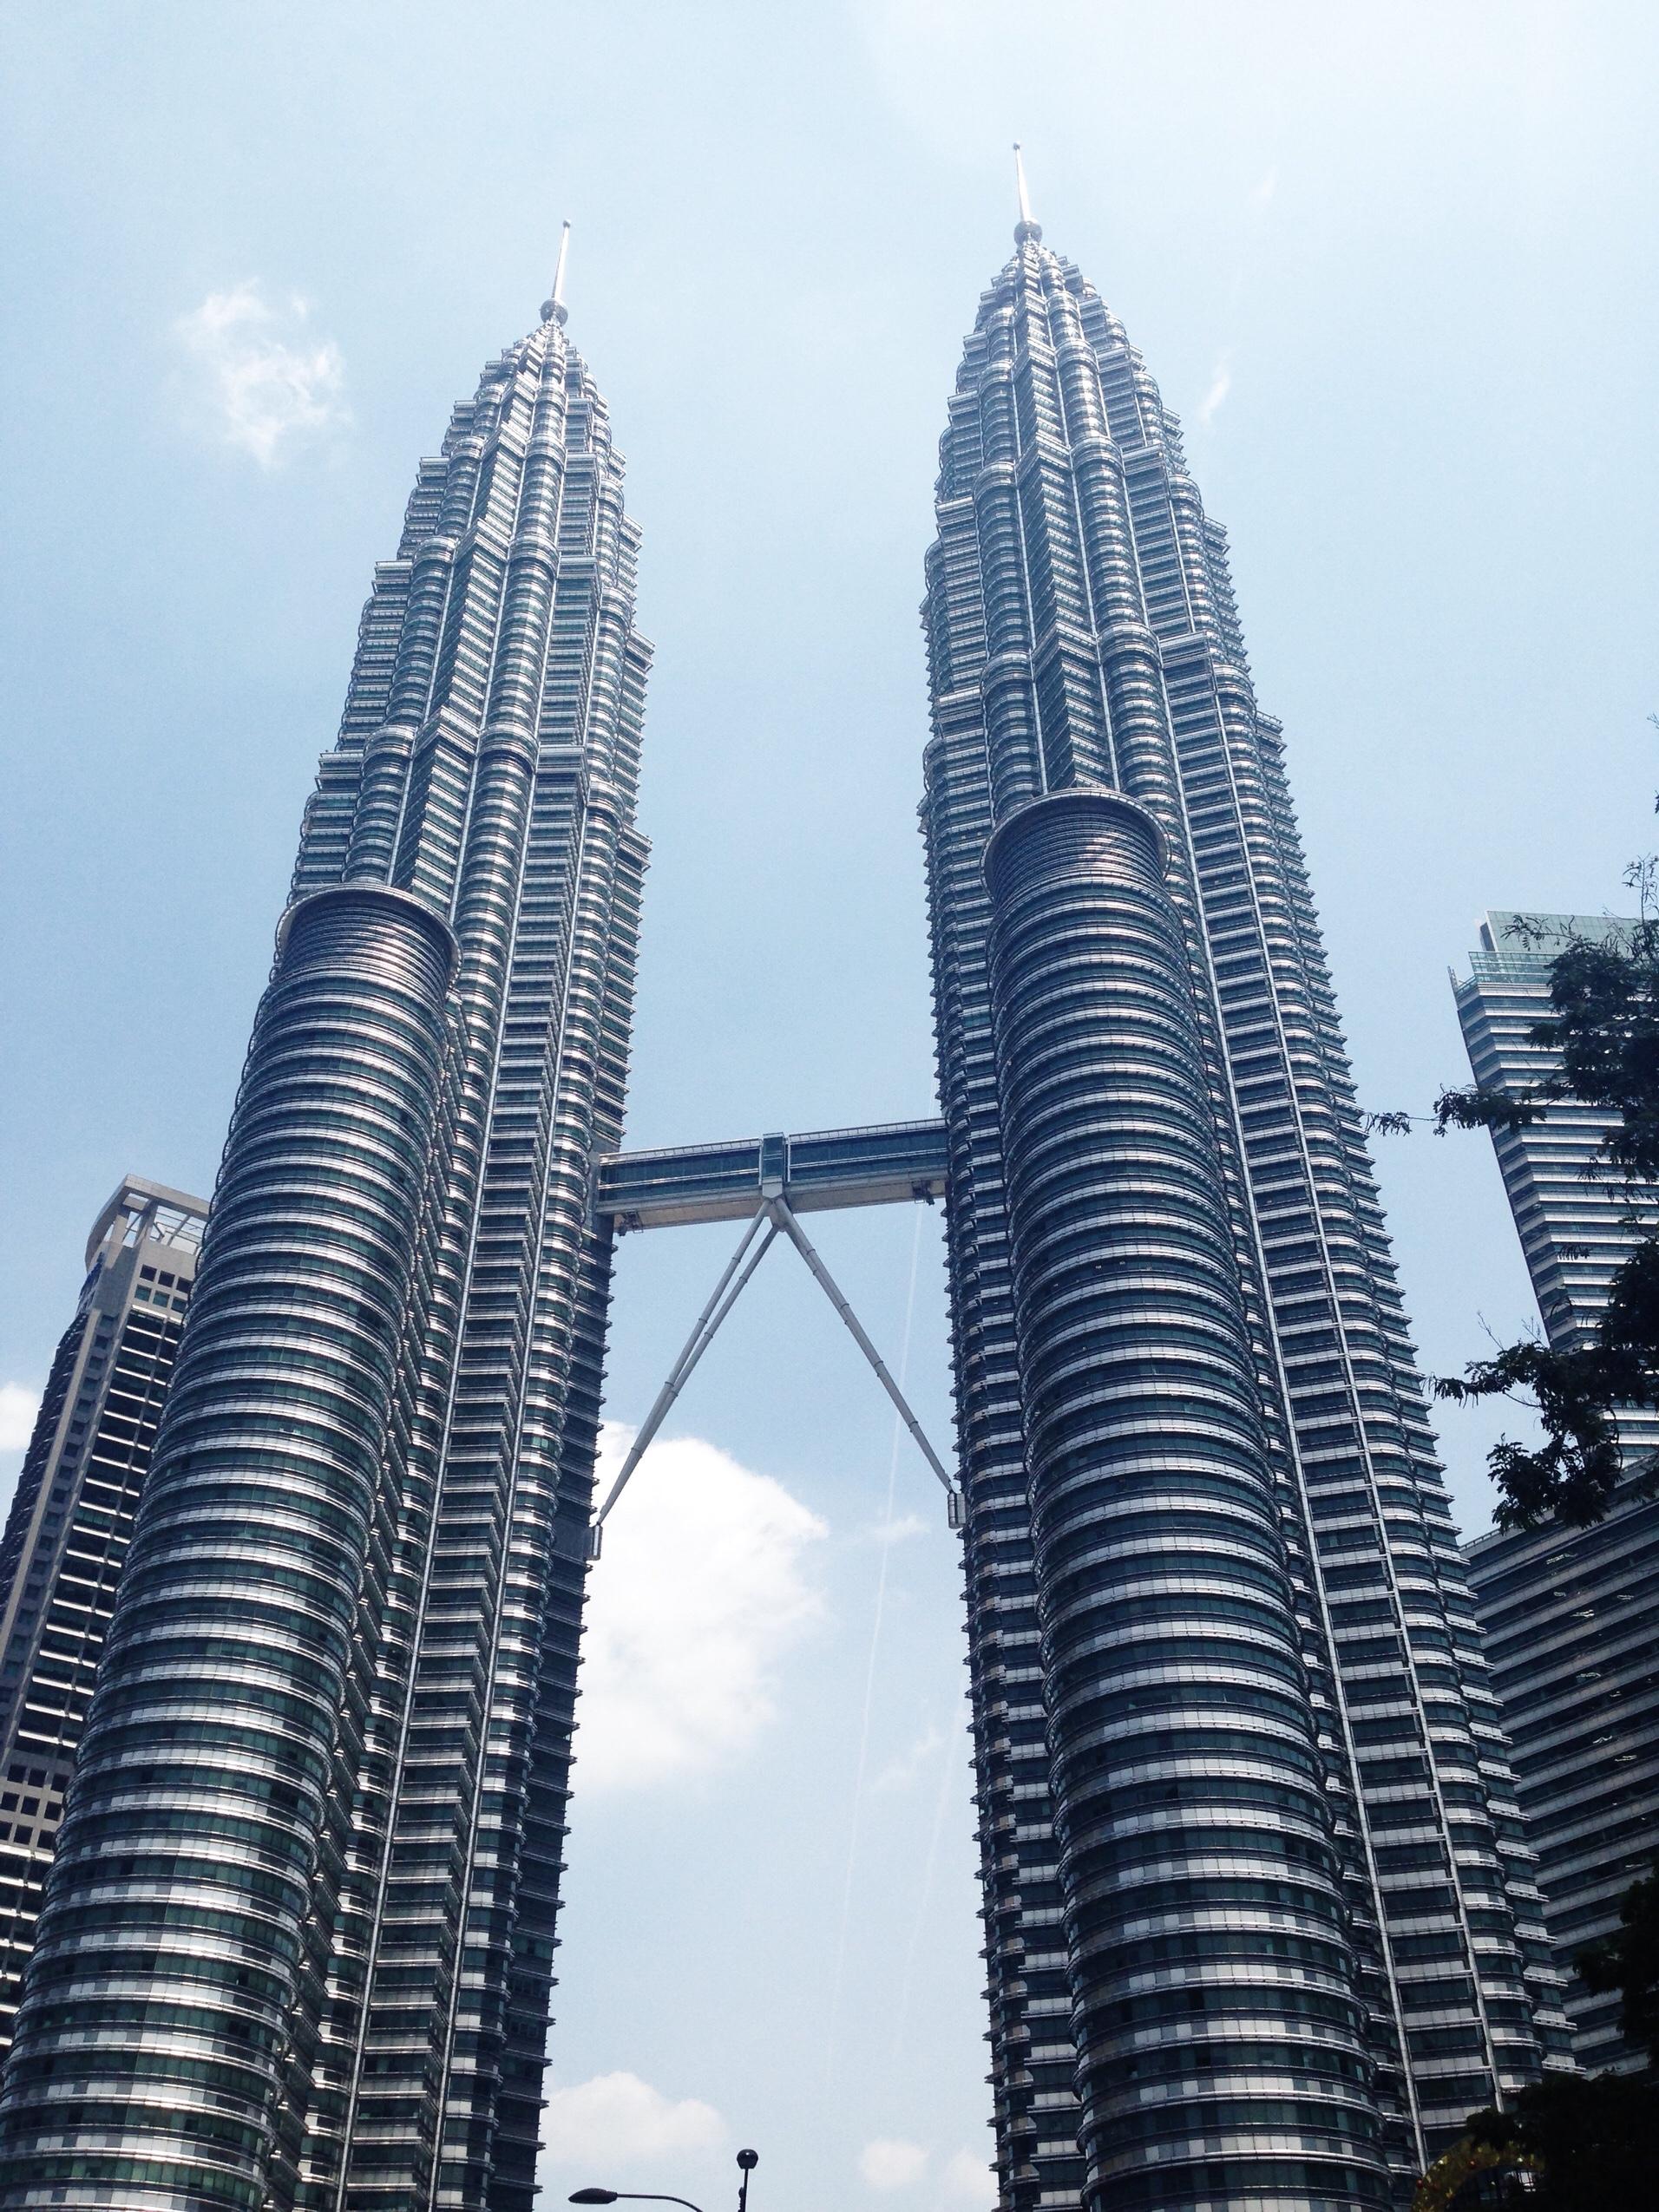 Image of Petronas Towers in Malaysia